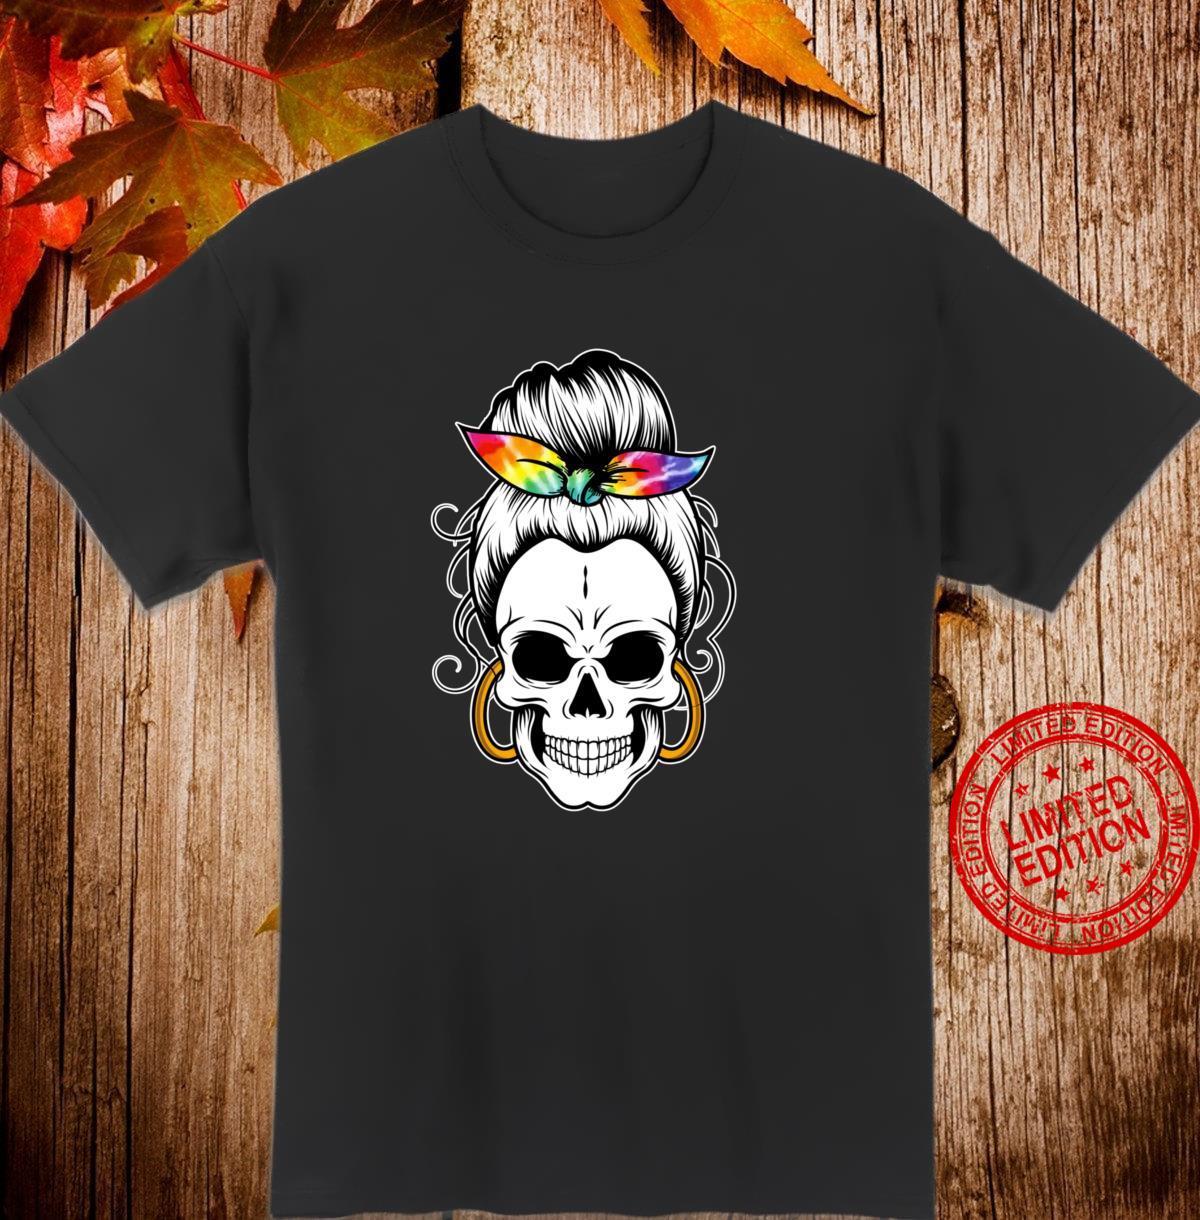 Messy Bun Skull Frauen Krawattenfarbstoff Hippie Halloween Langarmshirt Shirt